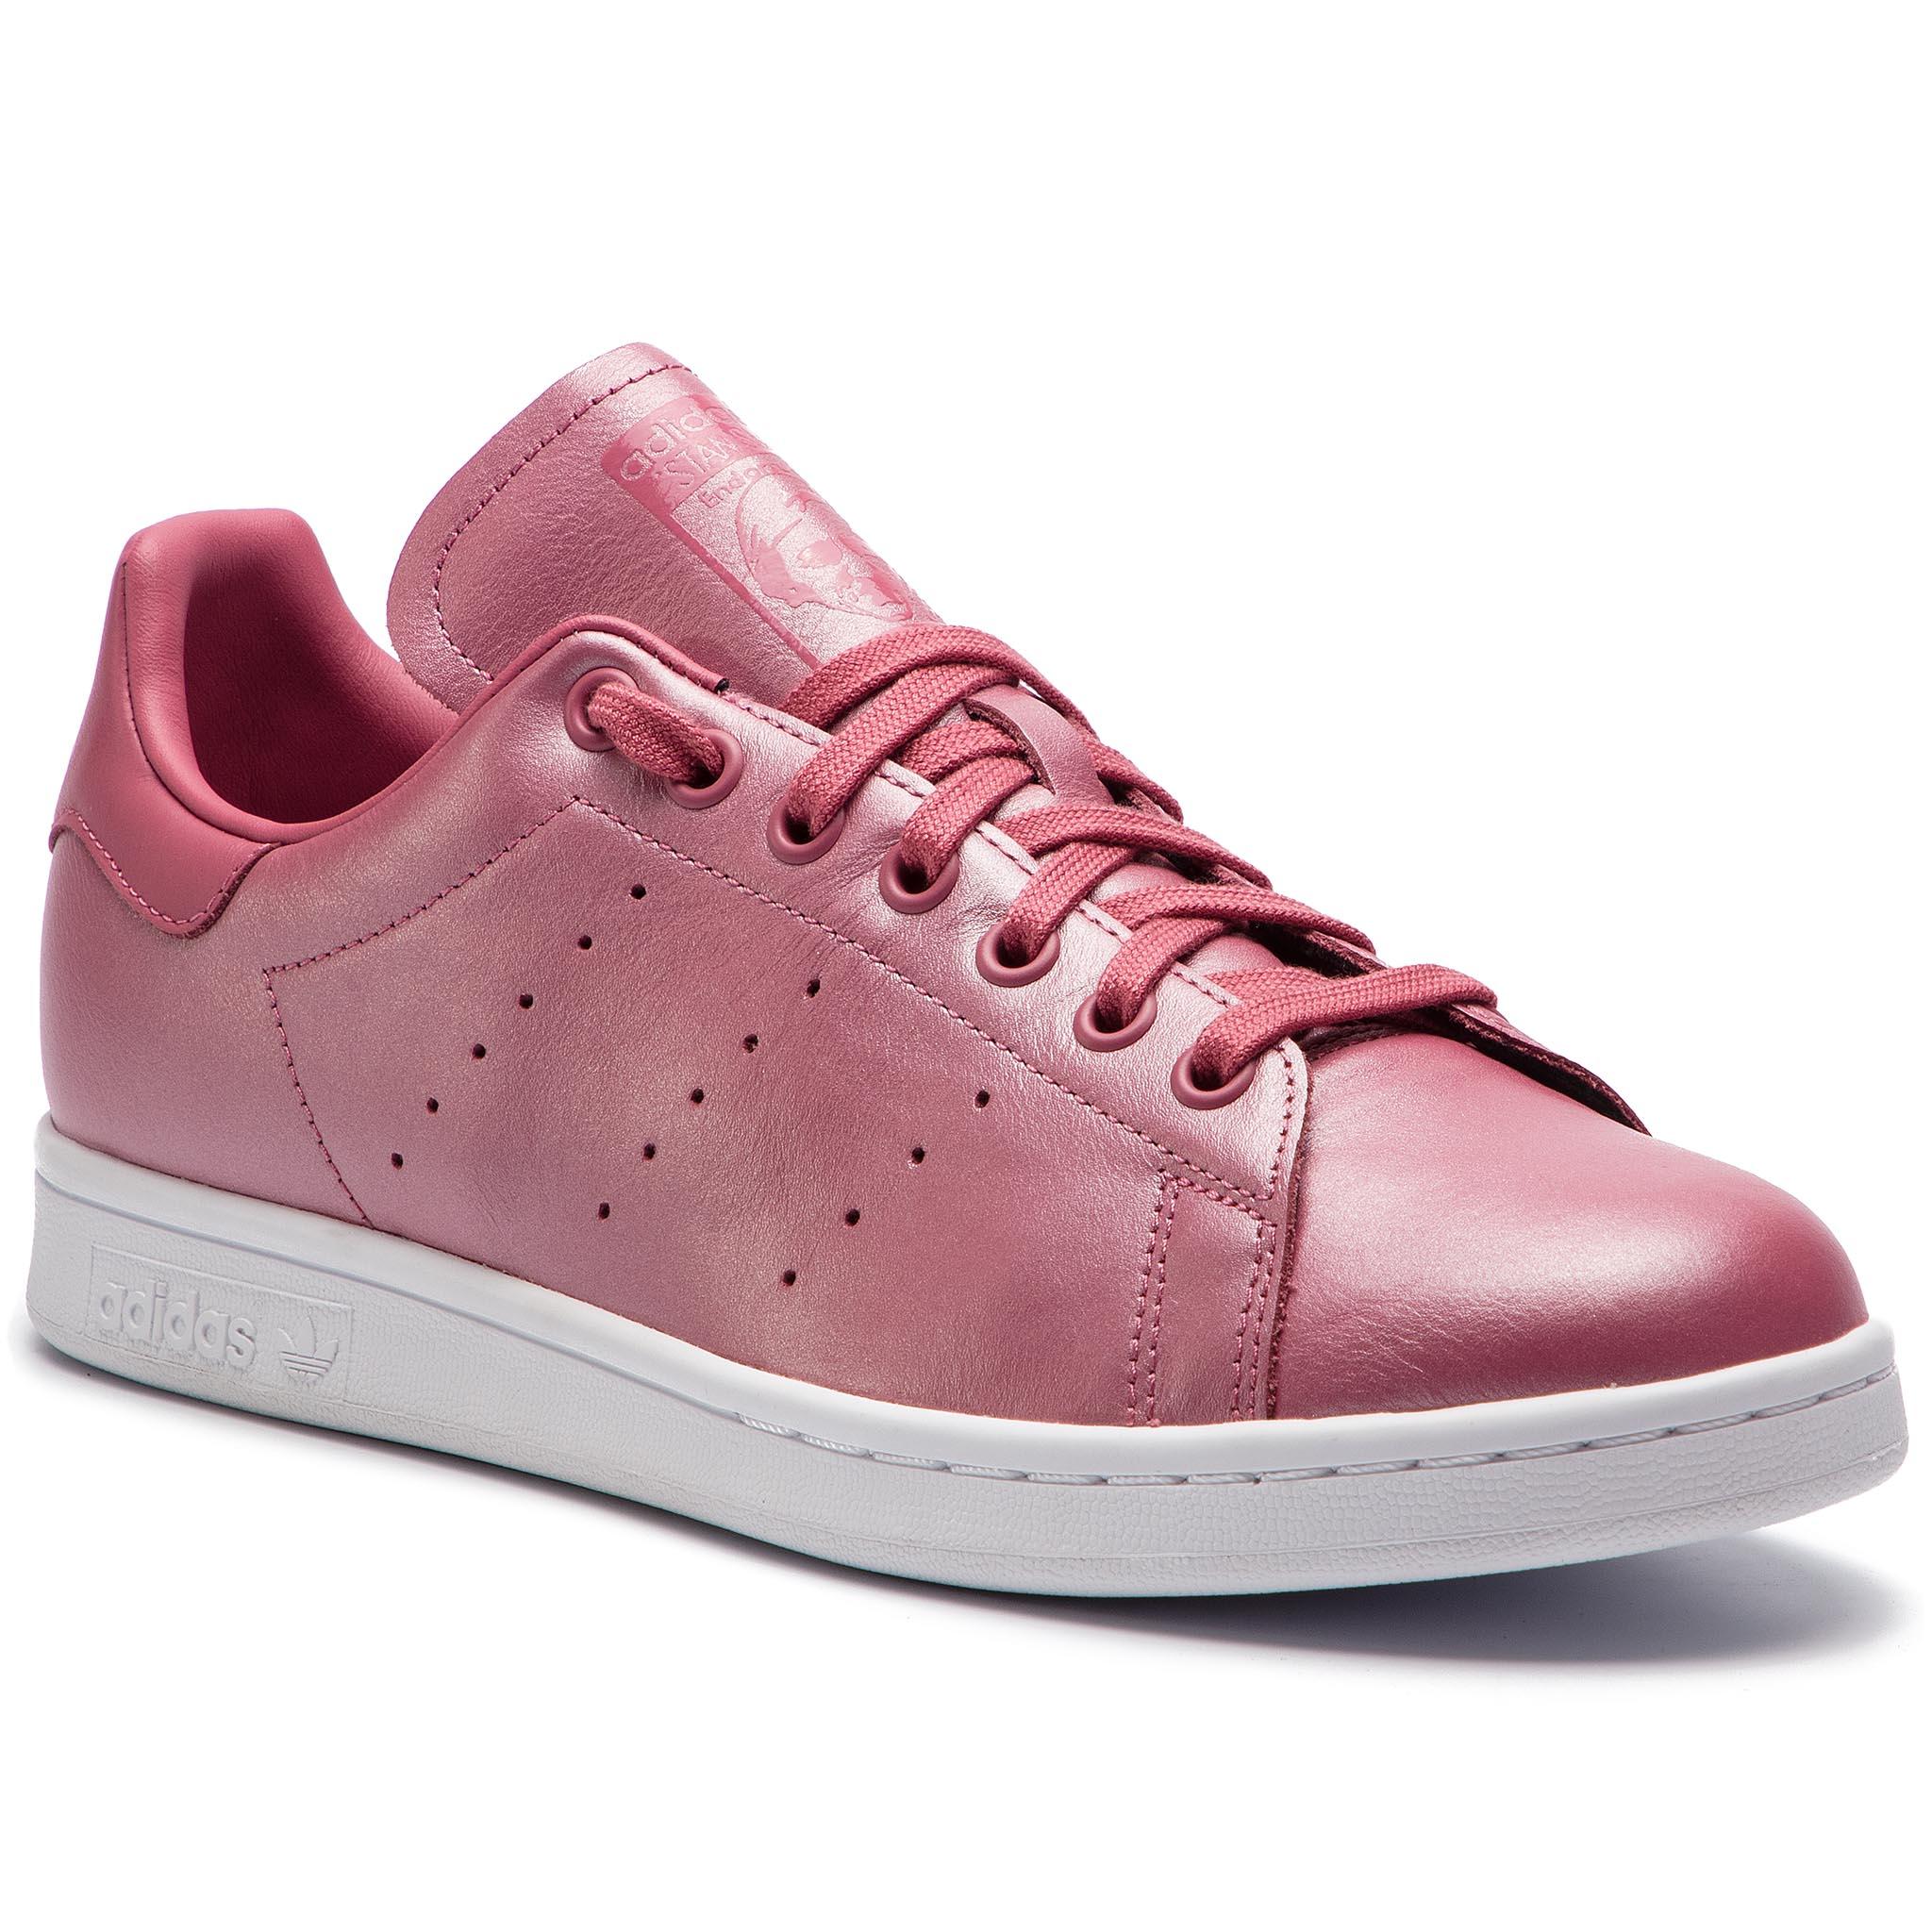 Cipő adidas Stan Smith W CM8603 TramarTramarFtwwht